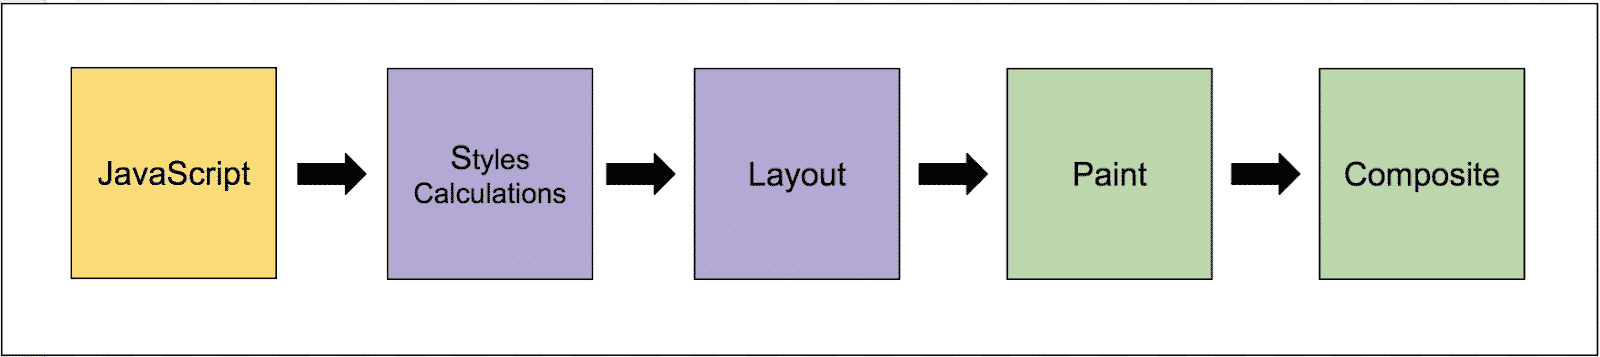 JavaScript to Composite